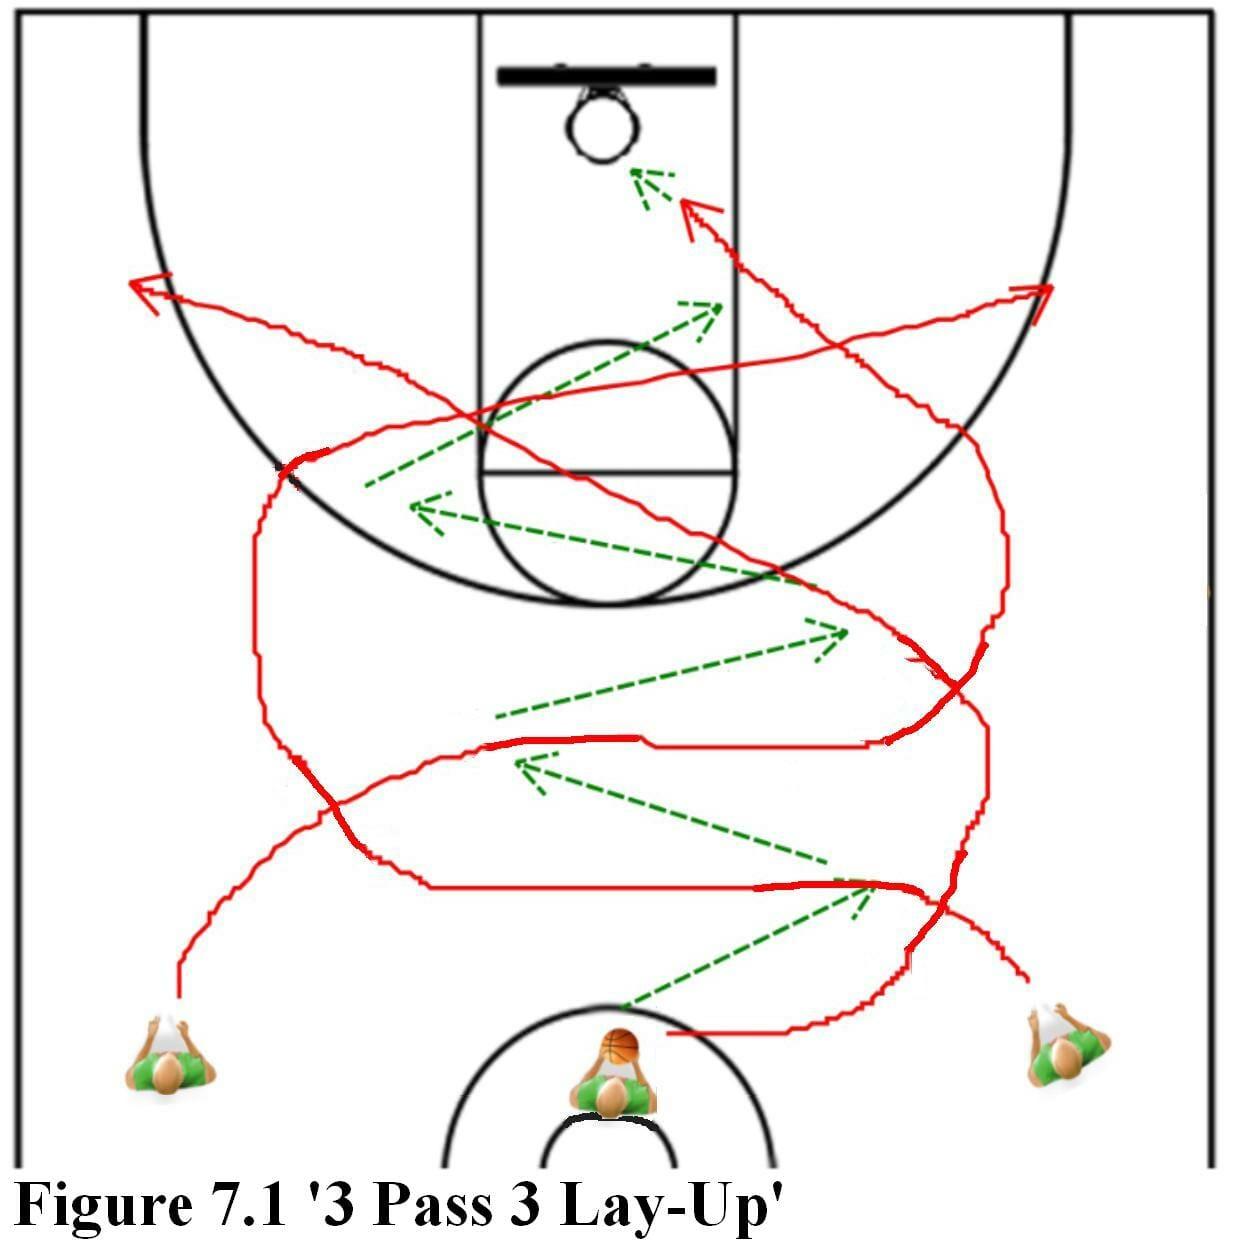 3 pass 3 lay up basketball drill